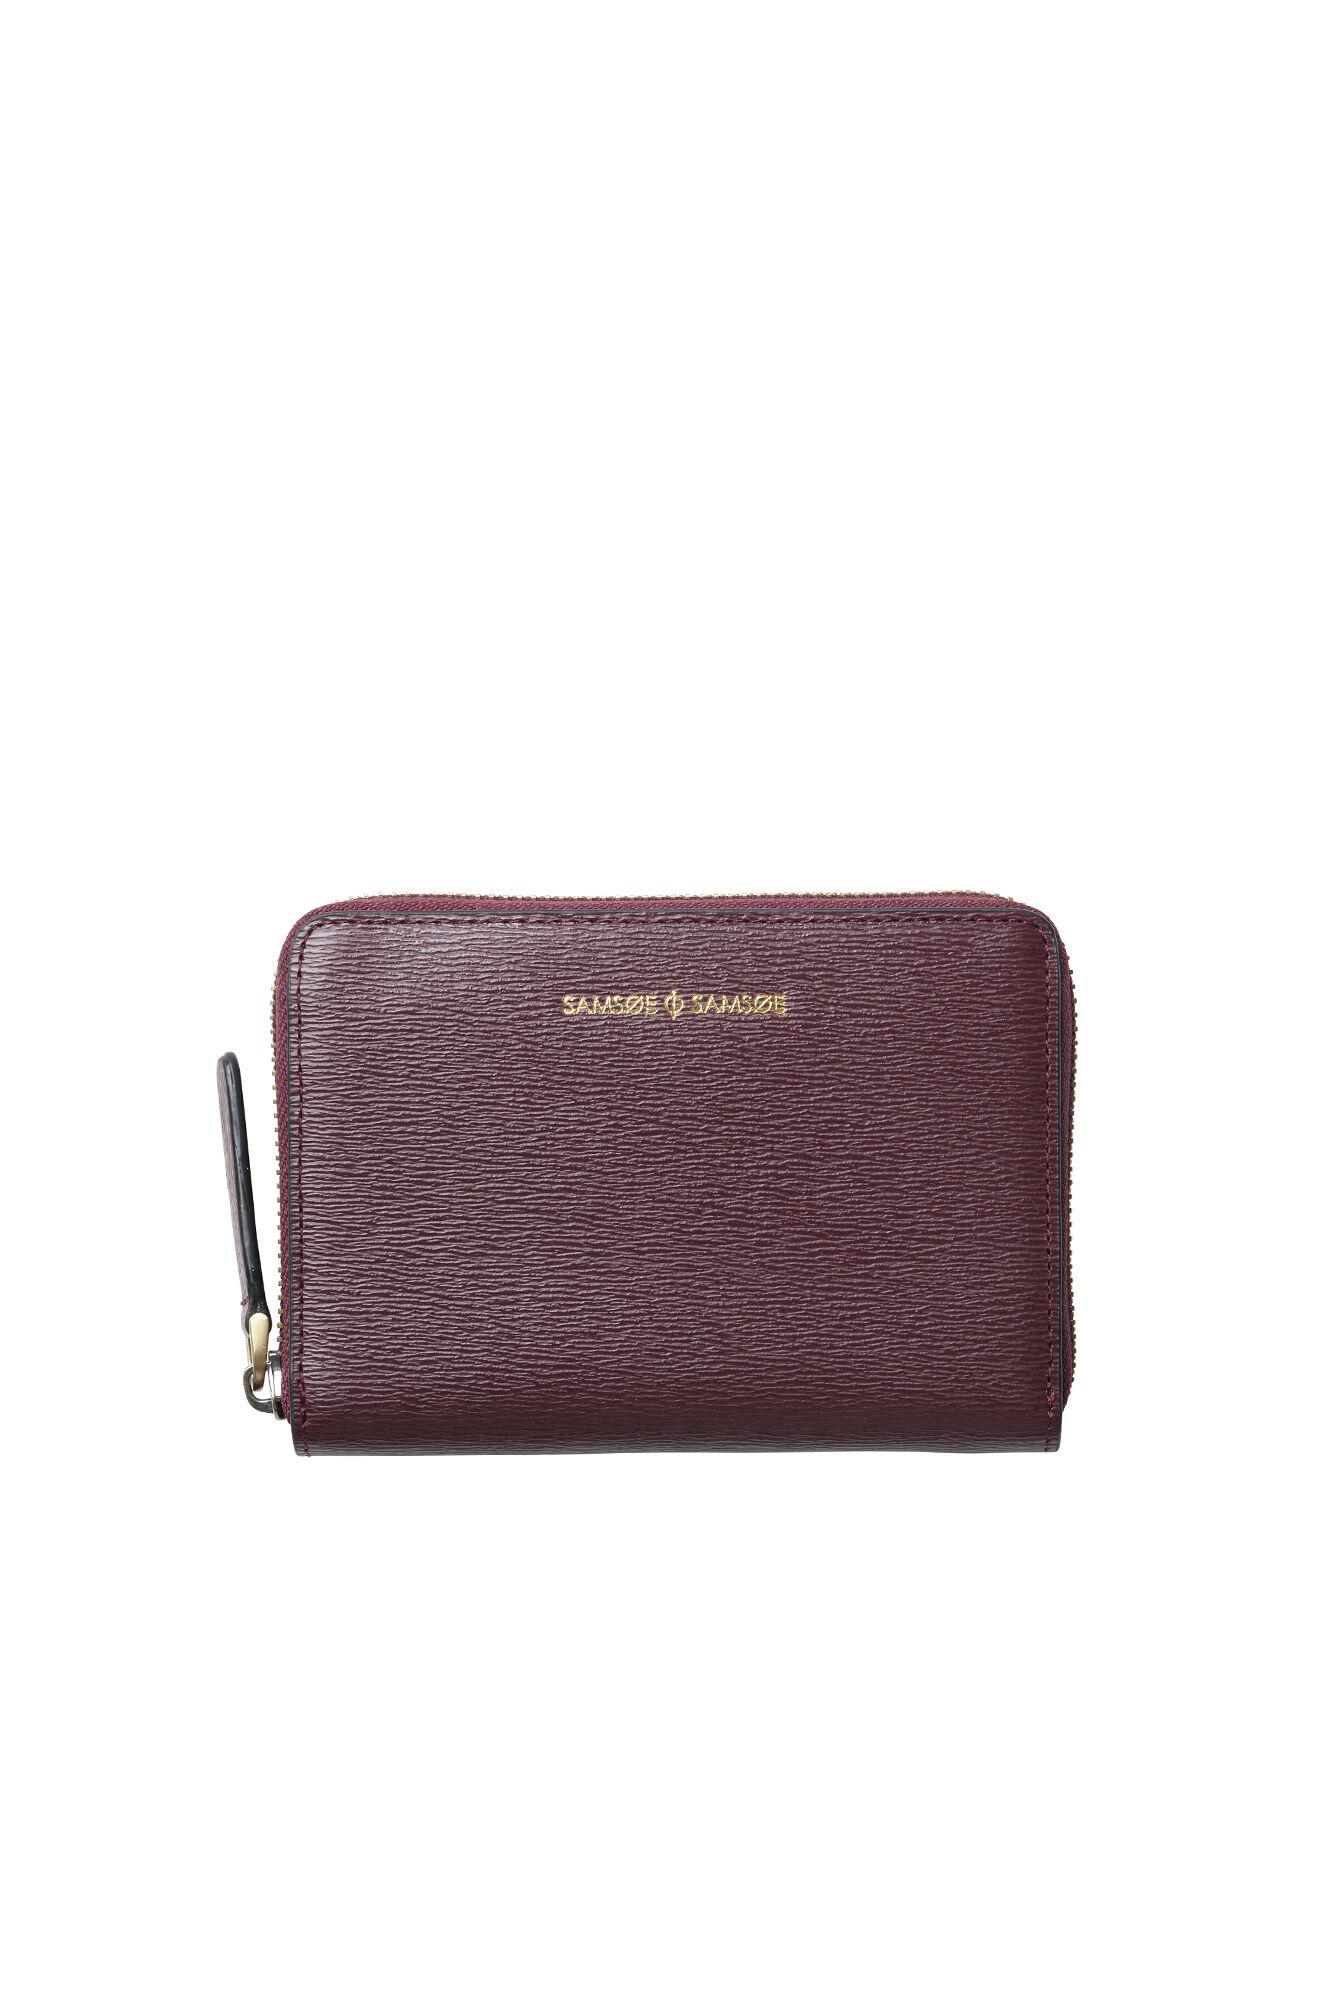 Fauna wallet 9641